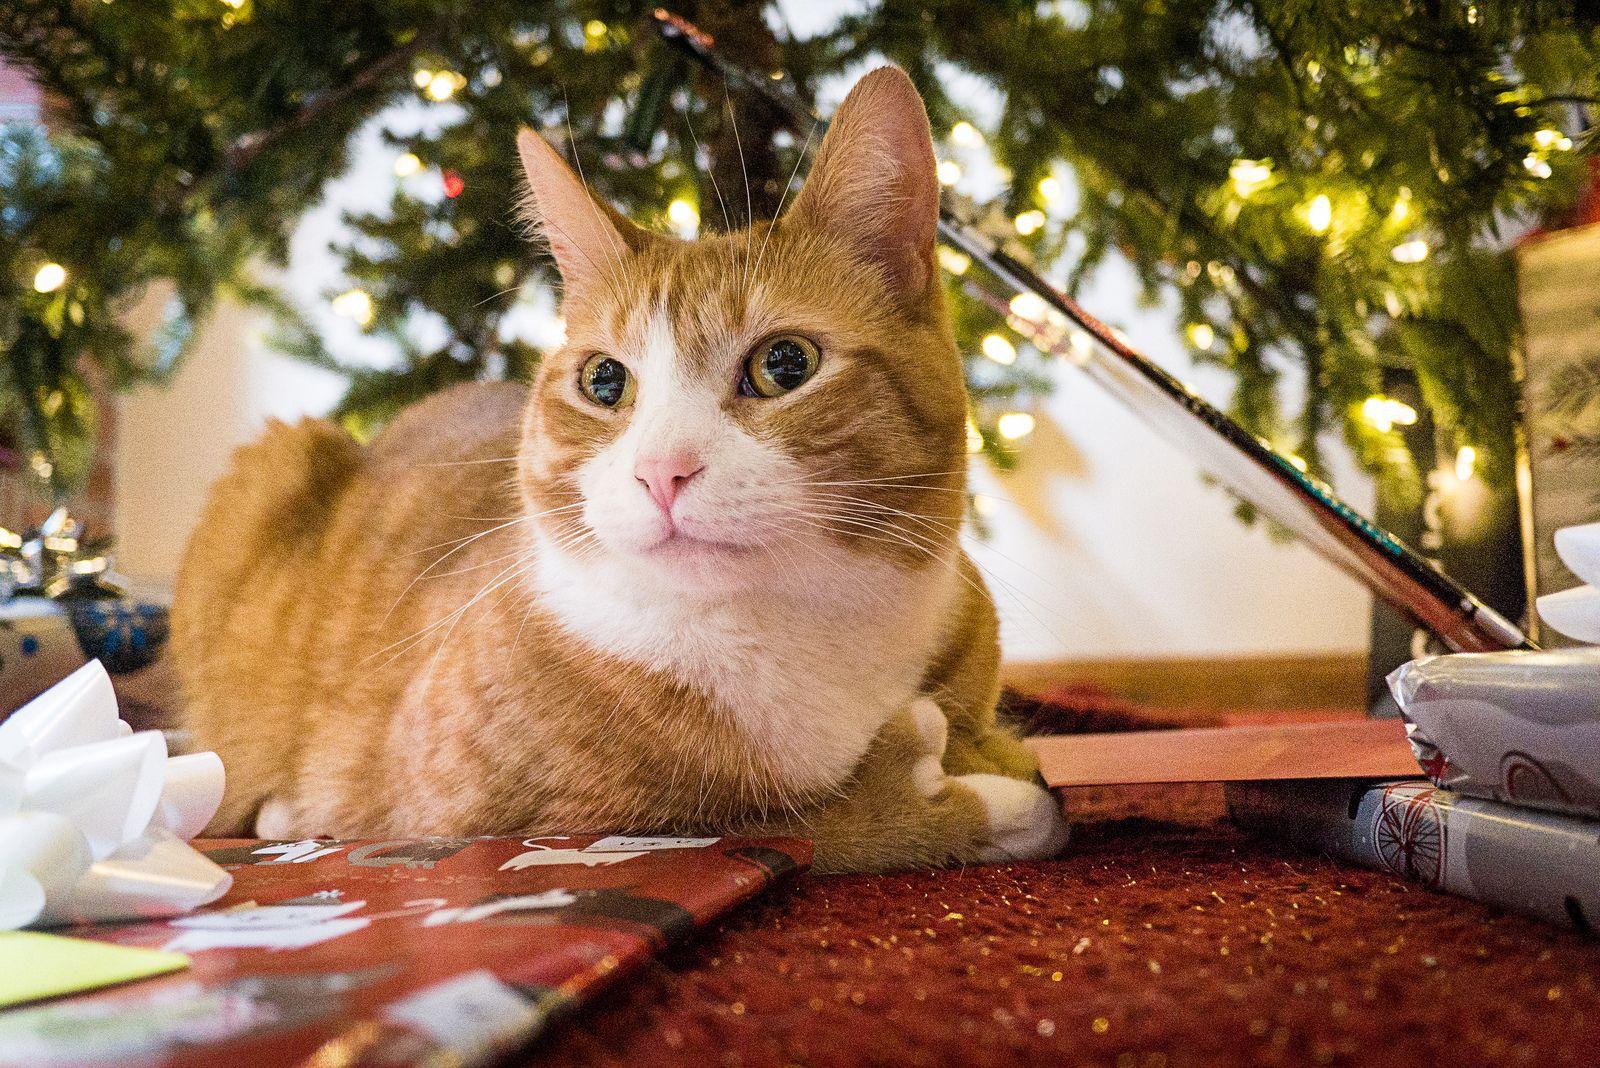 https://www.flickr.com/photos/tehchix0r/16161854256/in/pool-all_cats/